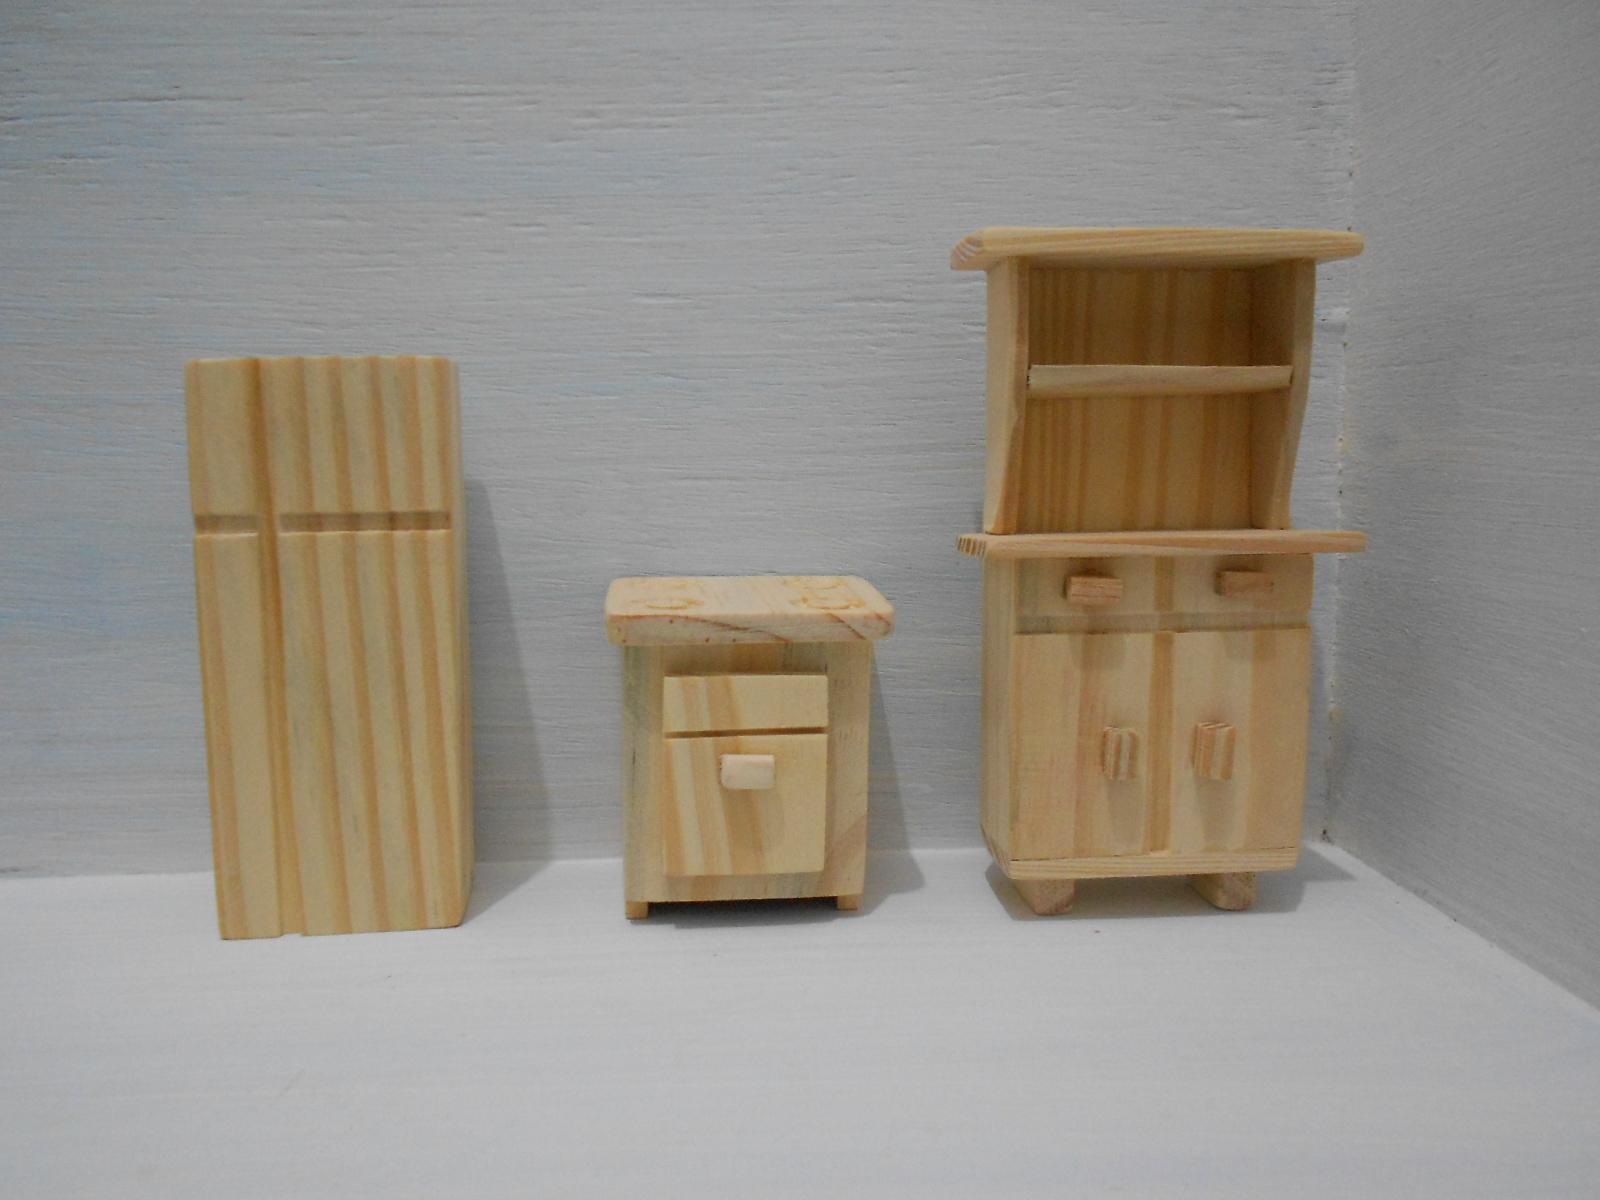 miniaturas cozinha 8 pecas aniversario kit moveis miniaturas cozinha  #68461D 1600x1200